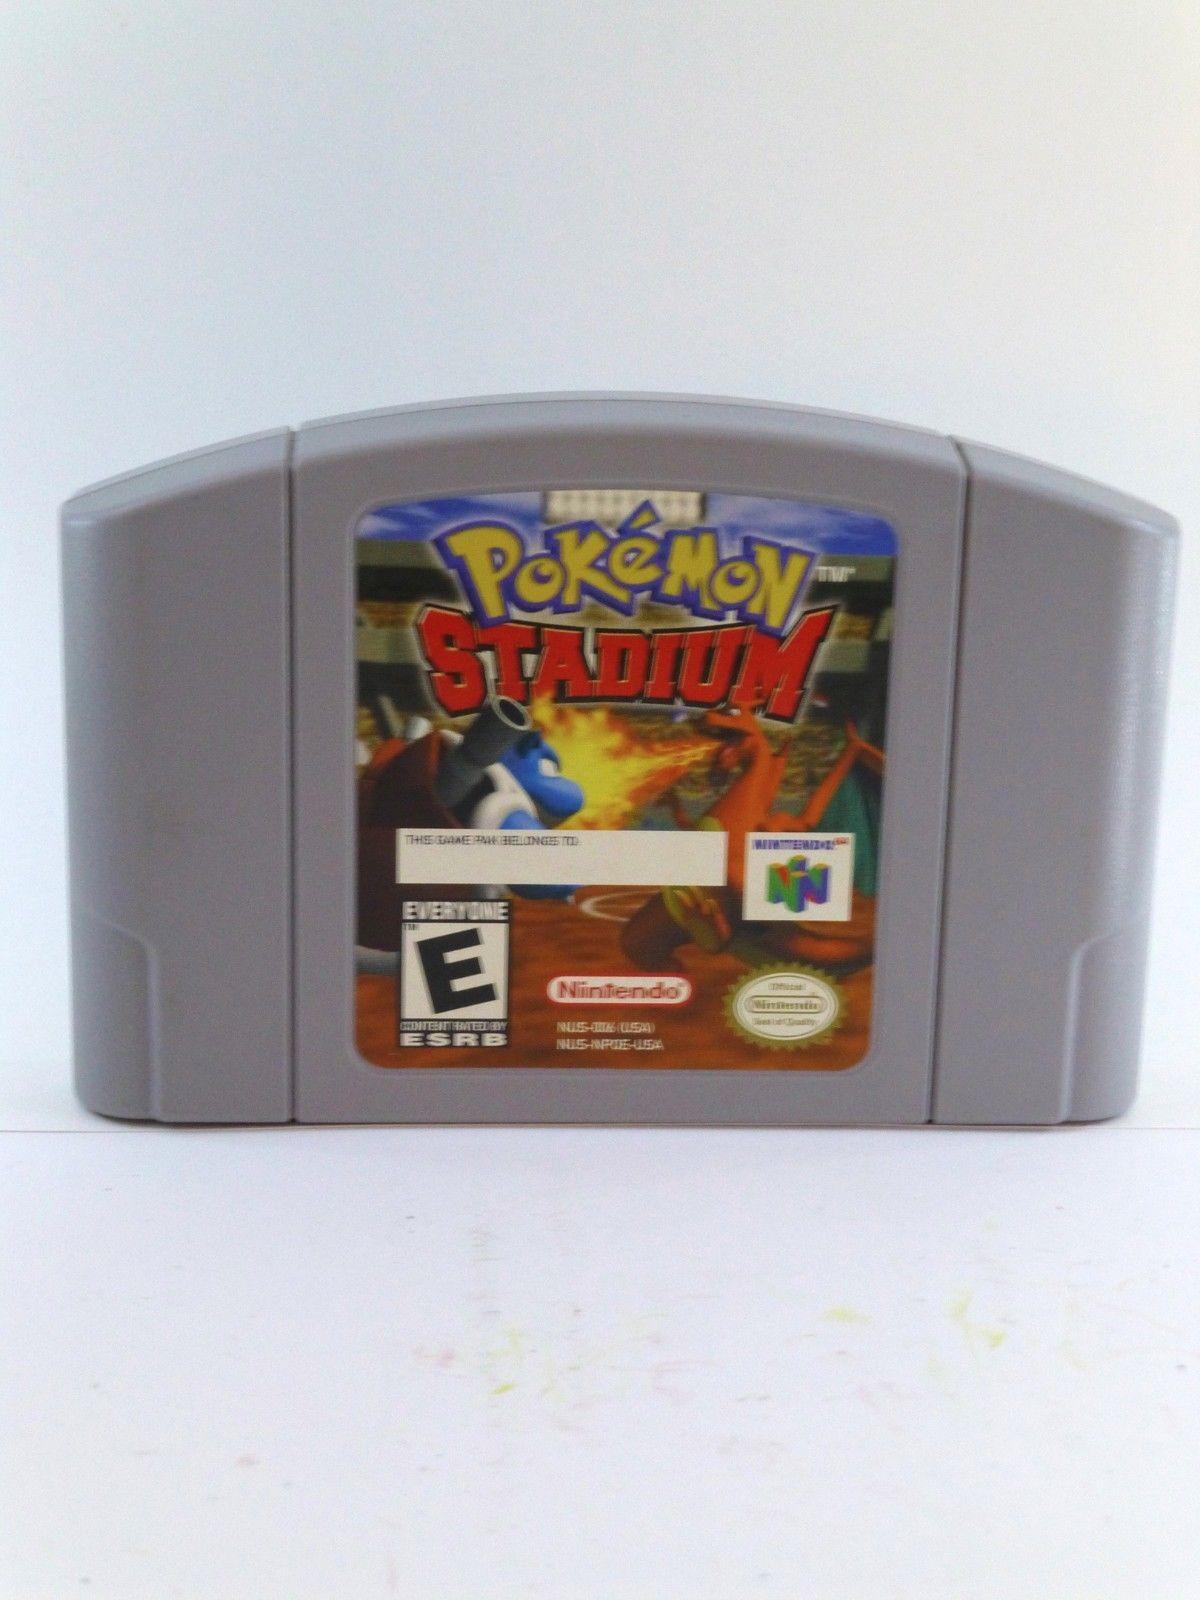 Pokemon Stadium (Nintendo 64, 2000) n64 with Gameboy